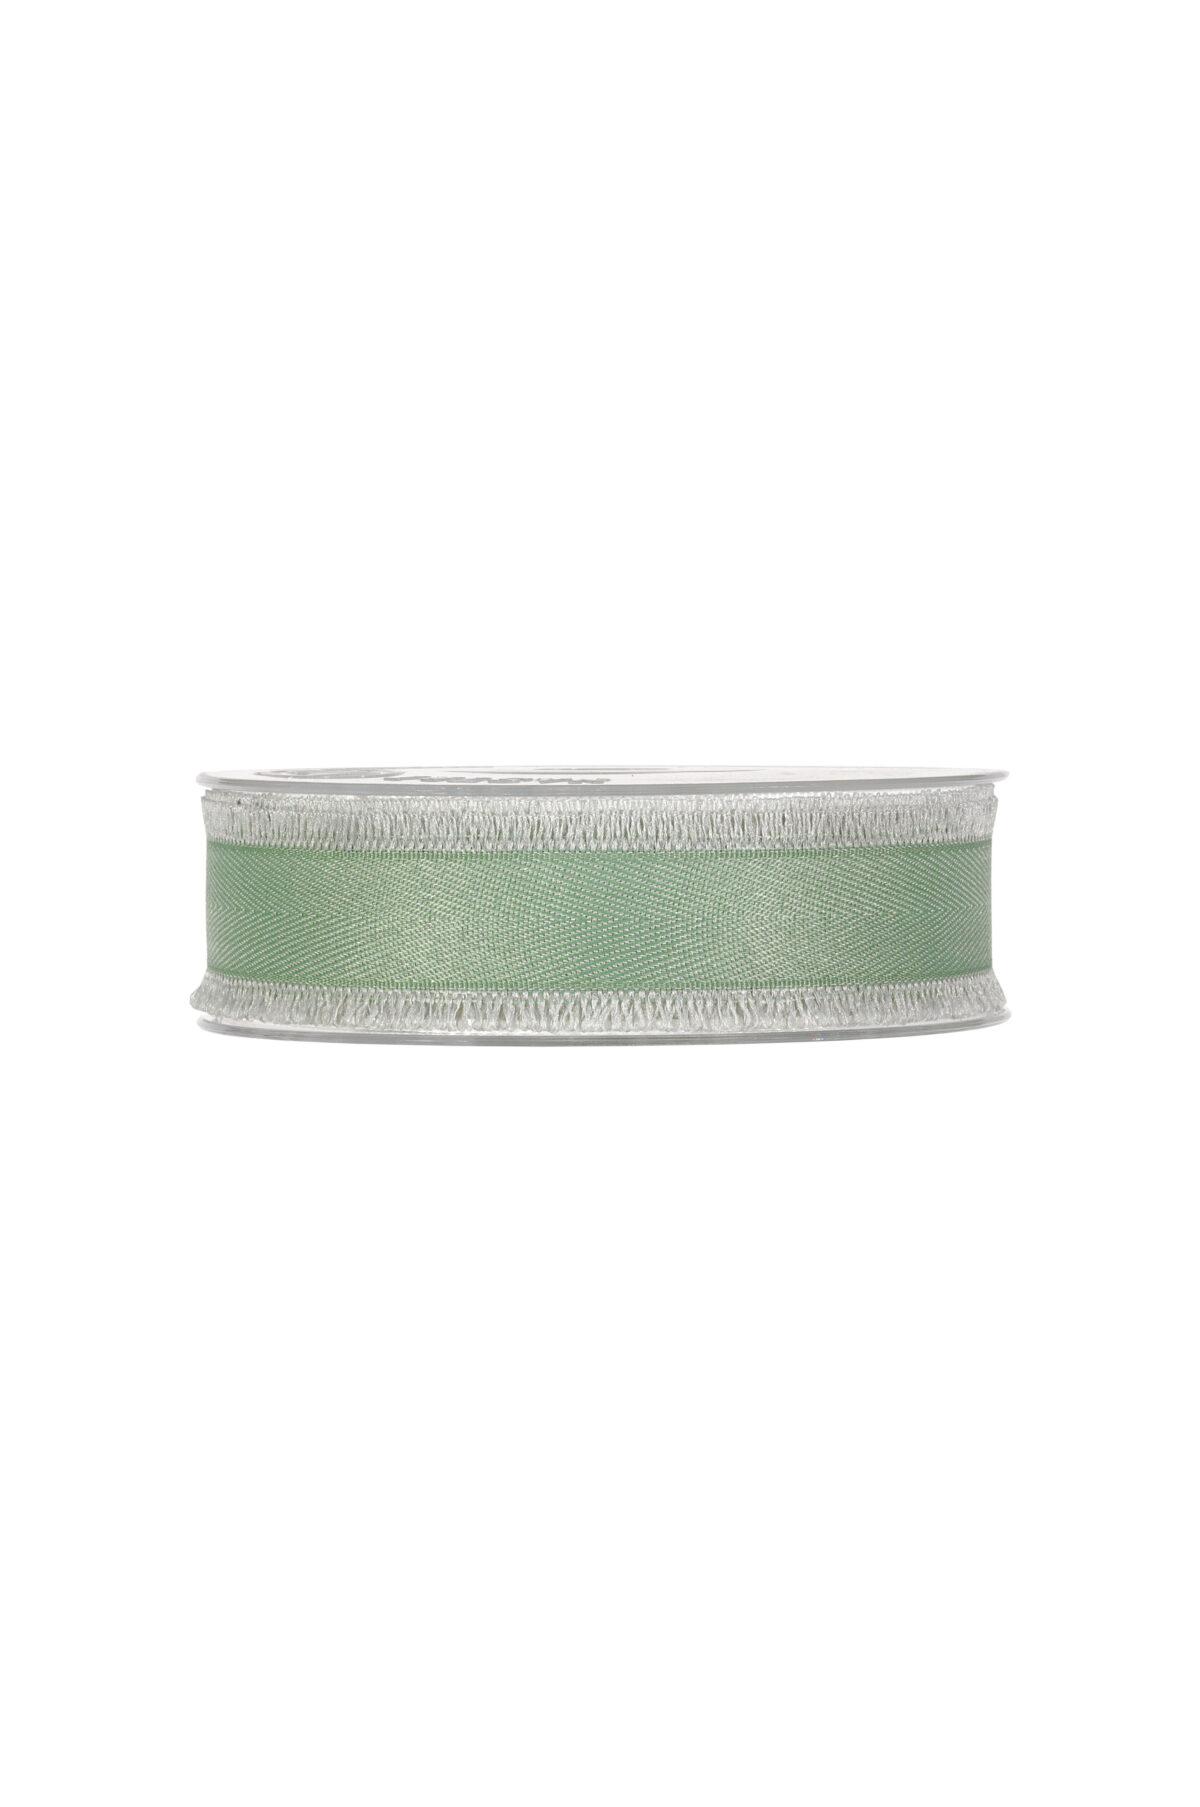 Nastro con frange verde 25 mm x 15 mt